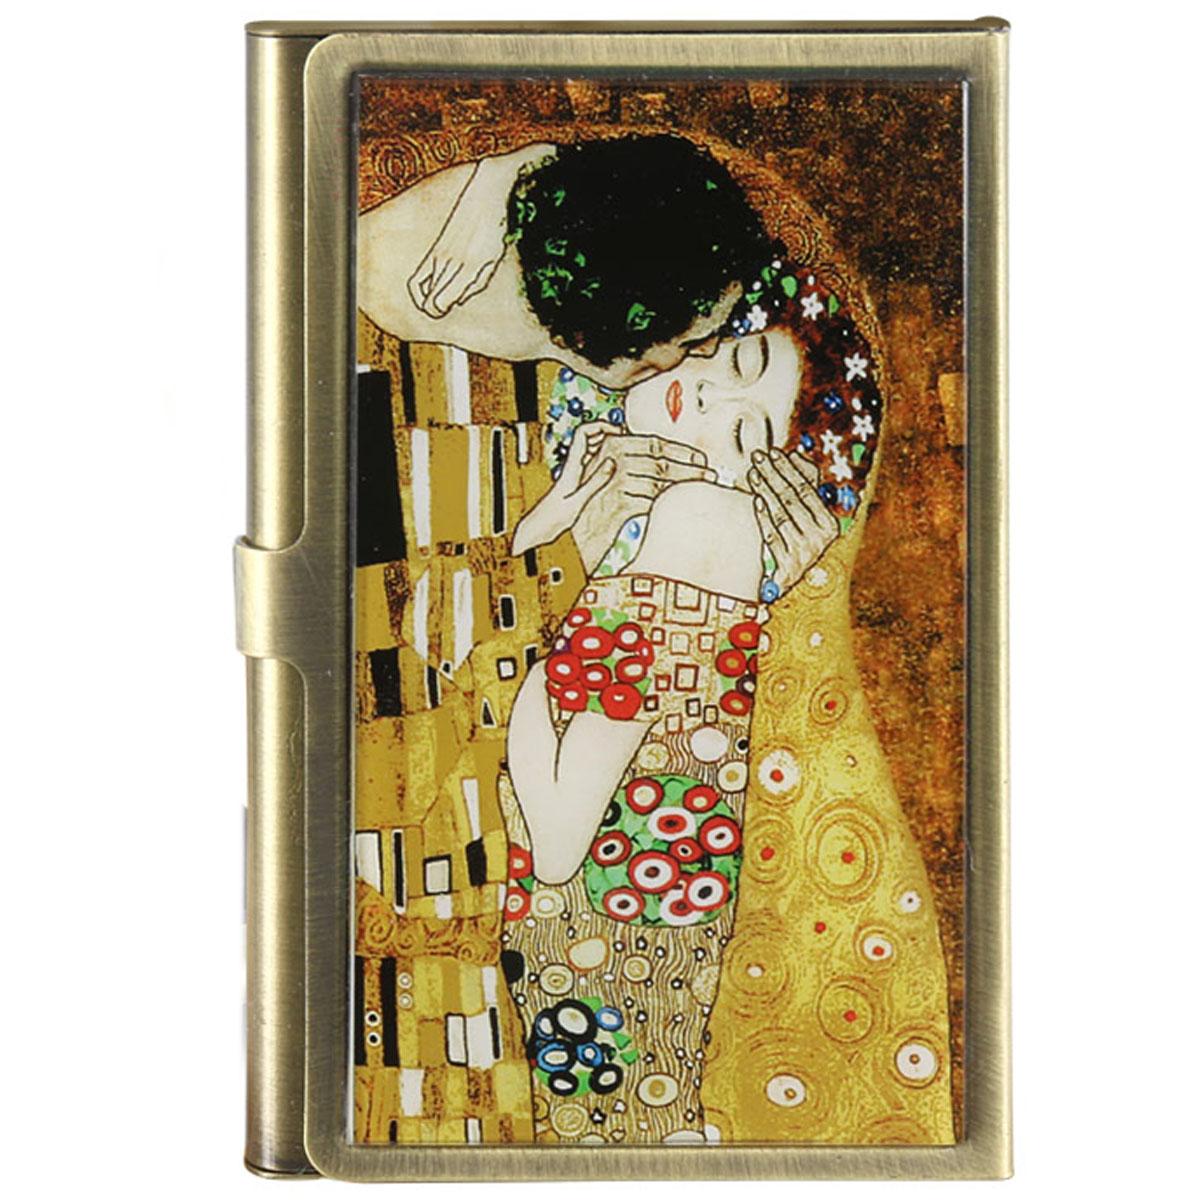 Porte-cartes \'Gustav Klimt\' (Le Baiser) - 90x55 mm - [Q6434]